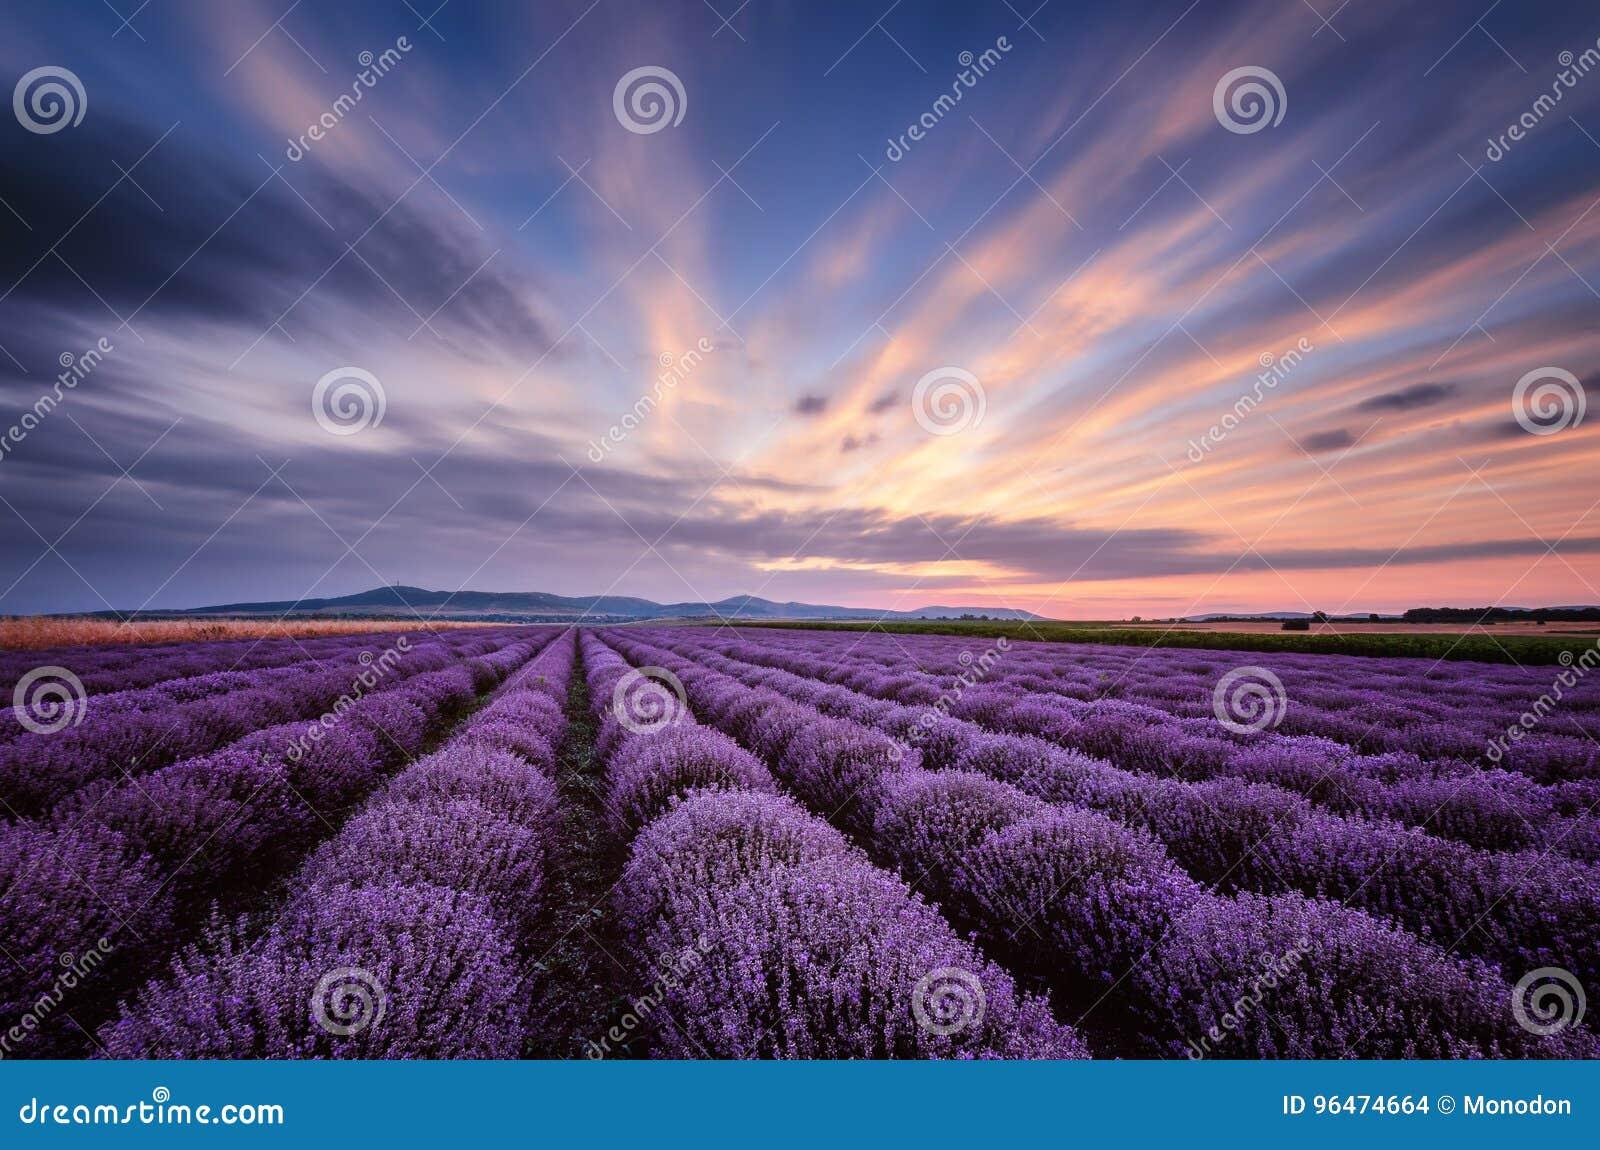 Before sunrise in lavender field